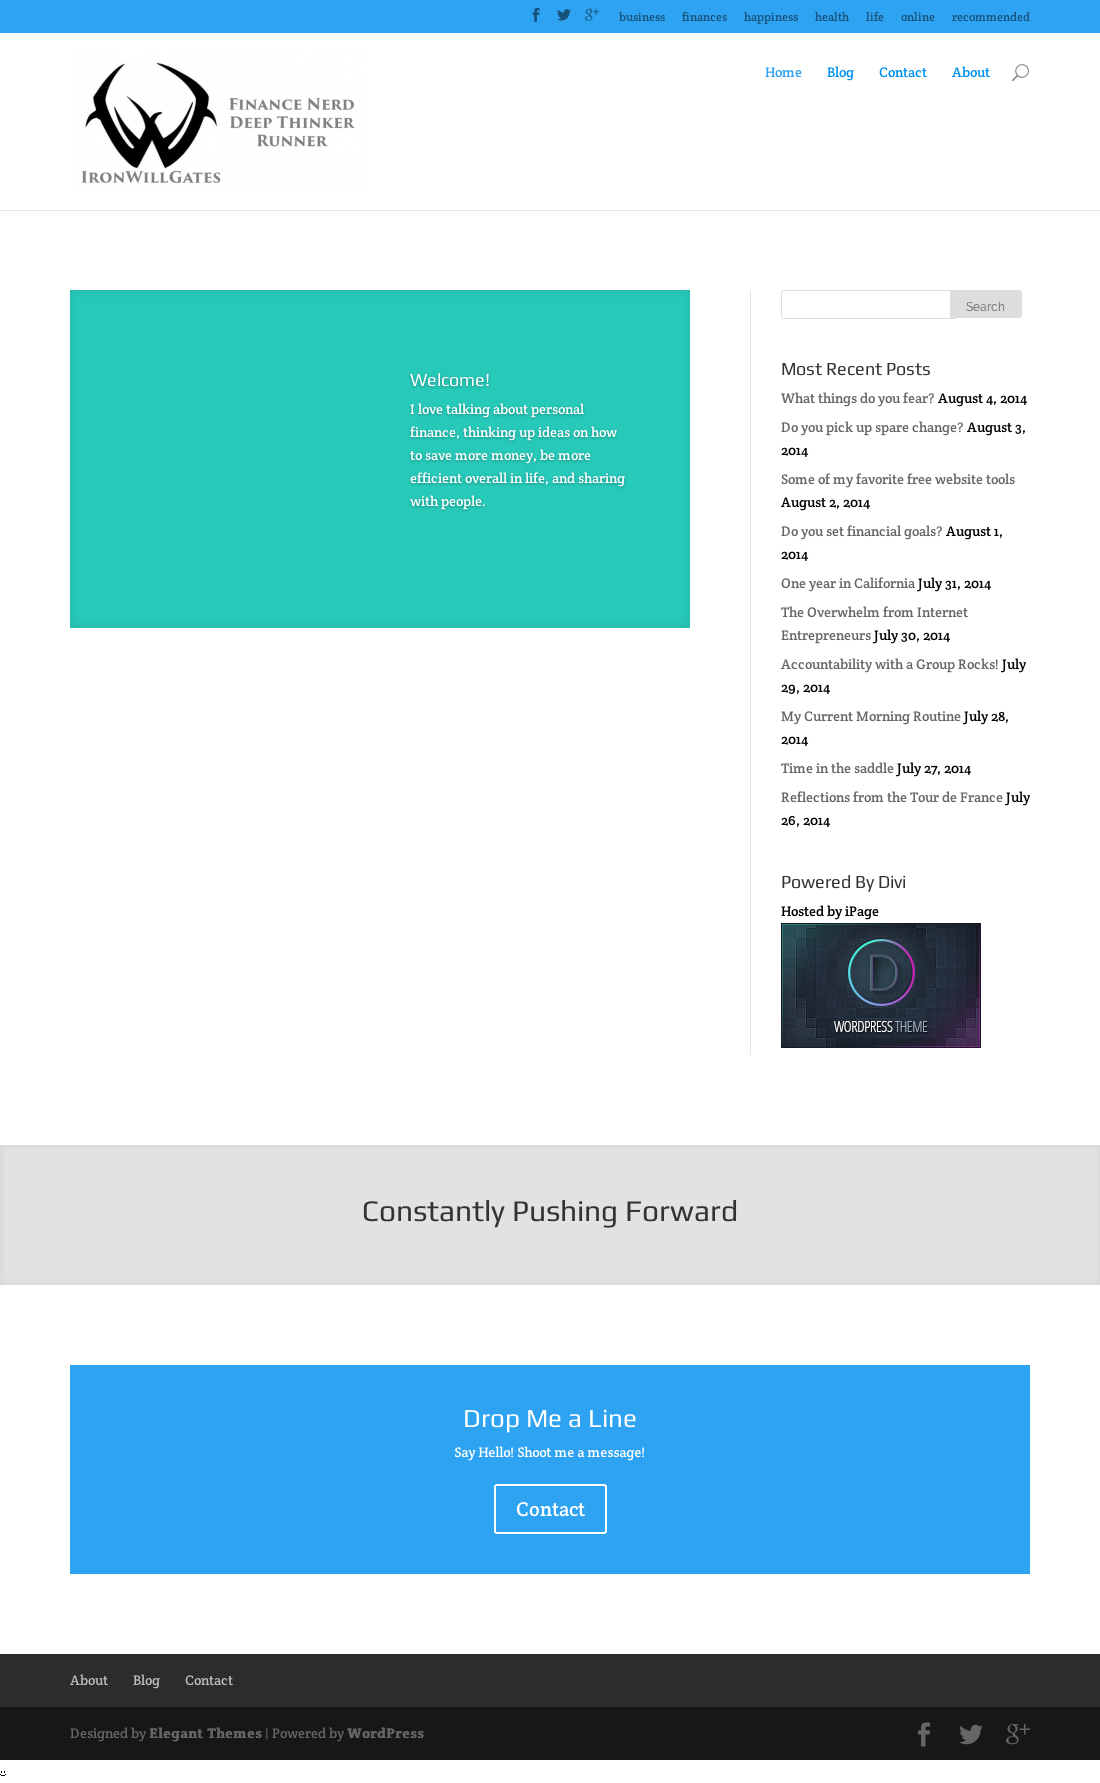 Designed by elegant themes powered by wordpress -  Finance Website On Wordpress Using The Divi Theme Designer William Gates